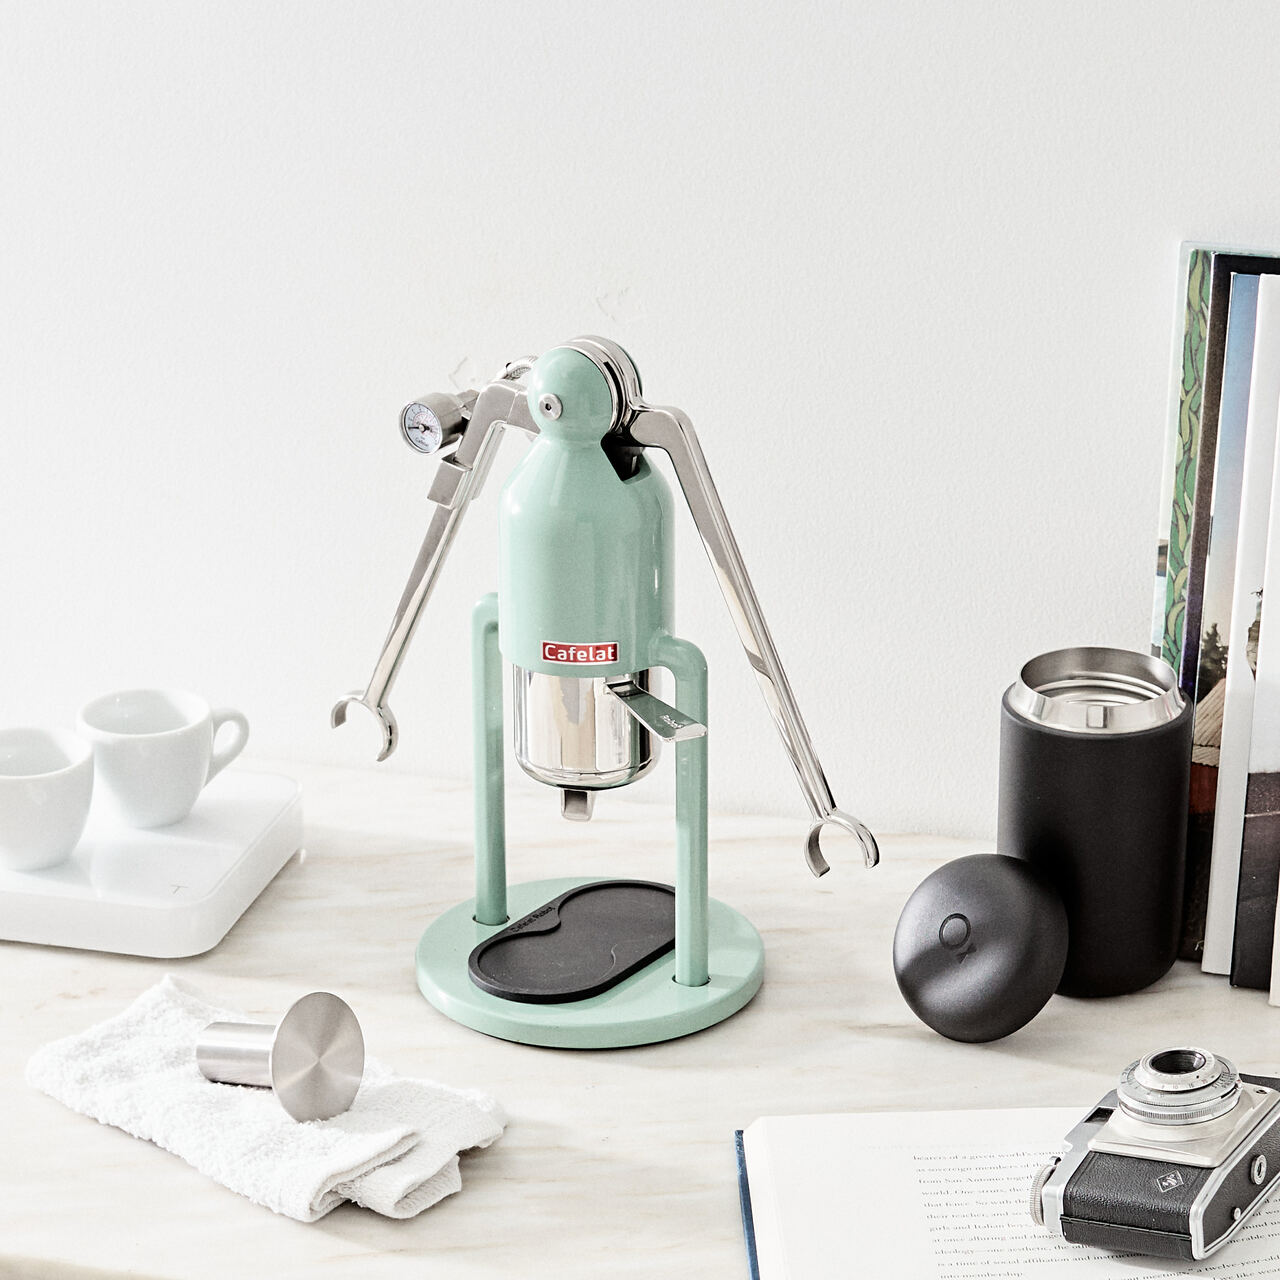 Cafelat Robot Manual Espresso Maker - Barista Version Retro Green - #304